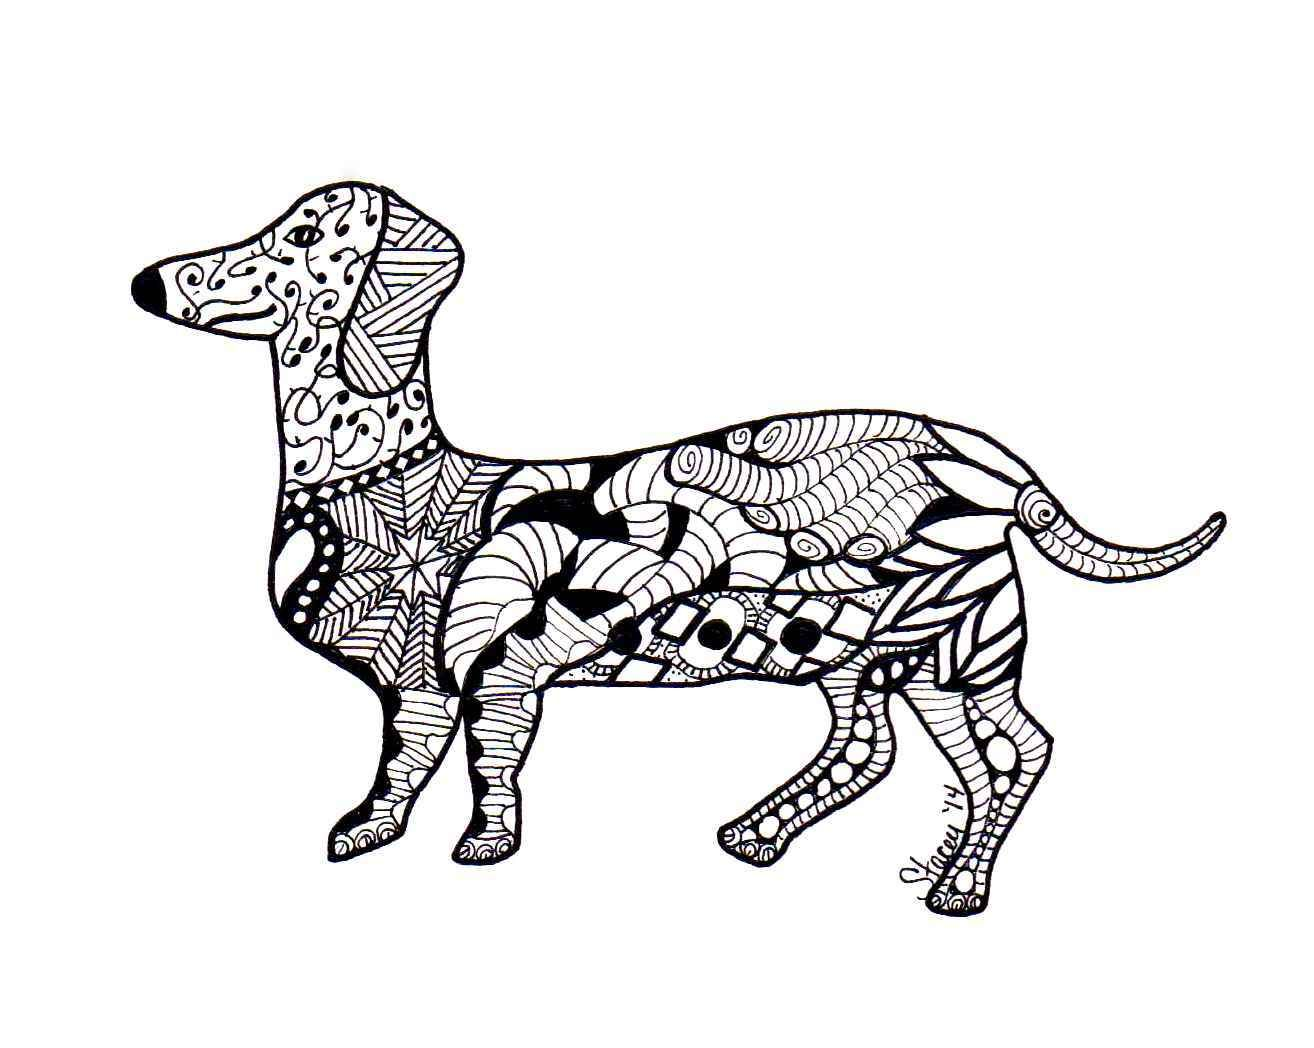 Zentangle Dachshund Dog Coloring Page Animal Coloring Pages Coloring Pages